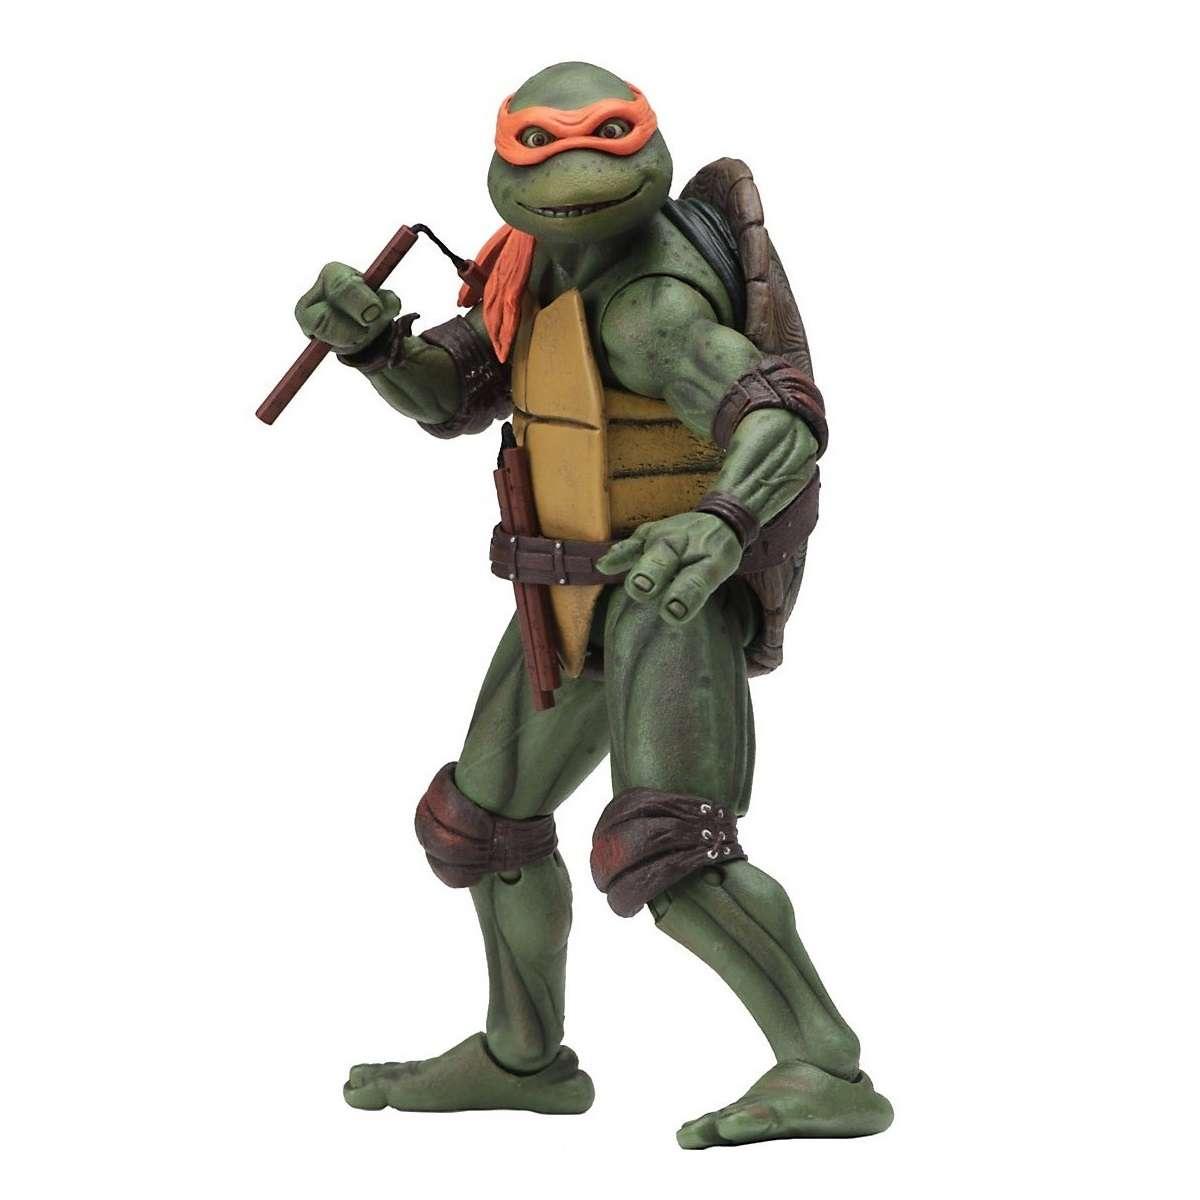 Action Figure: Teenage Mutant Ninja Turtles - Michelangelo Photo